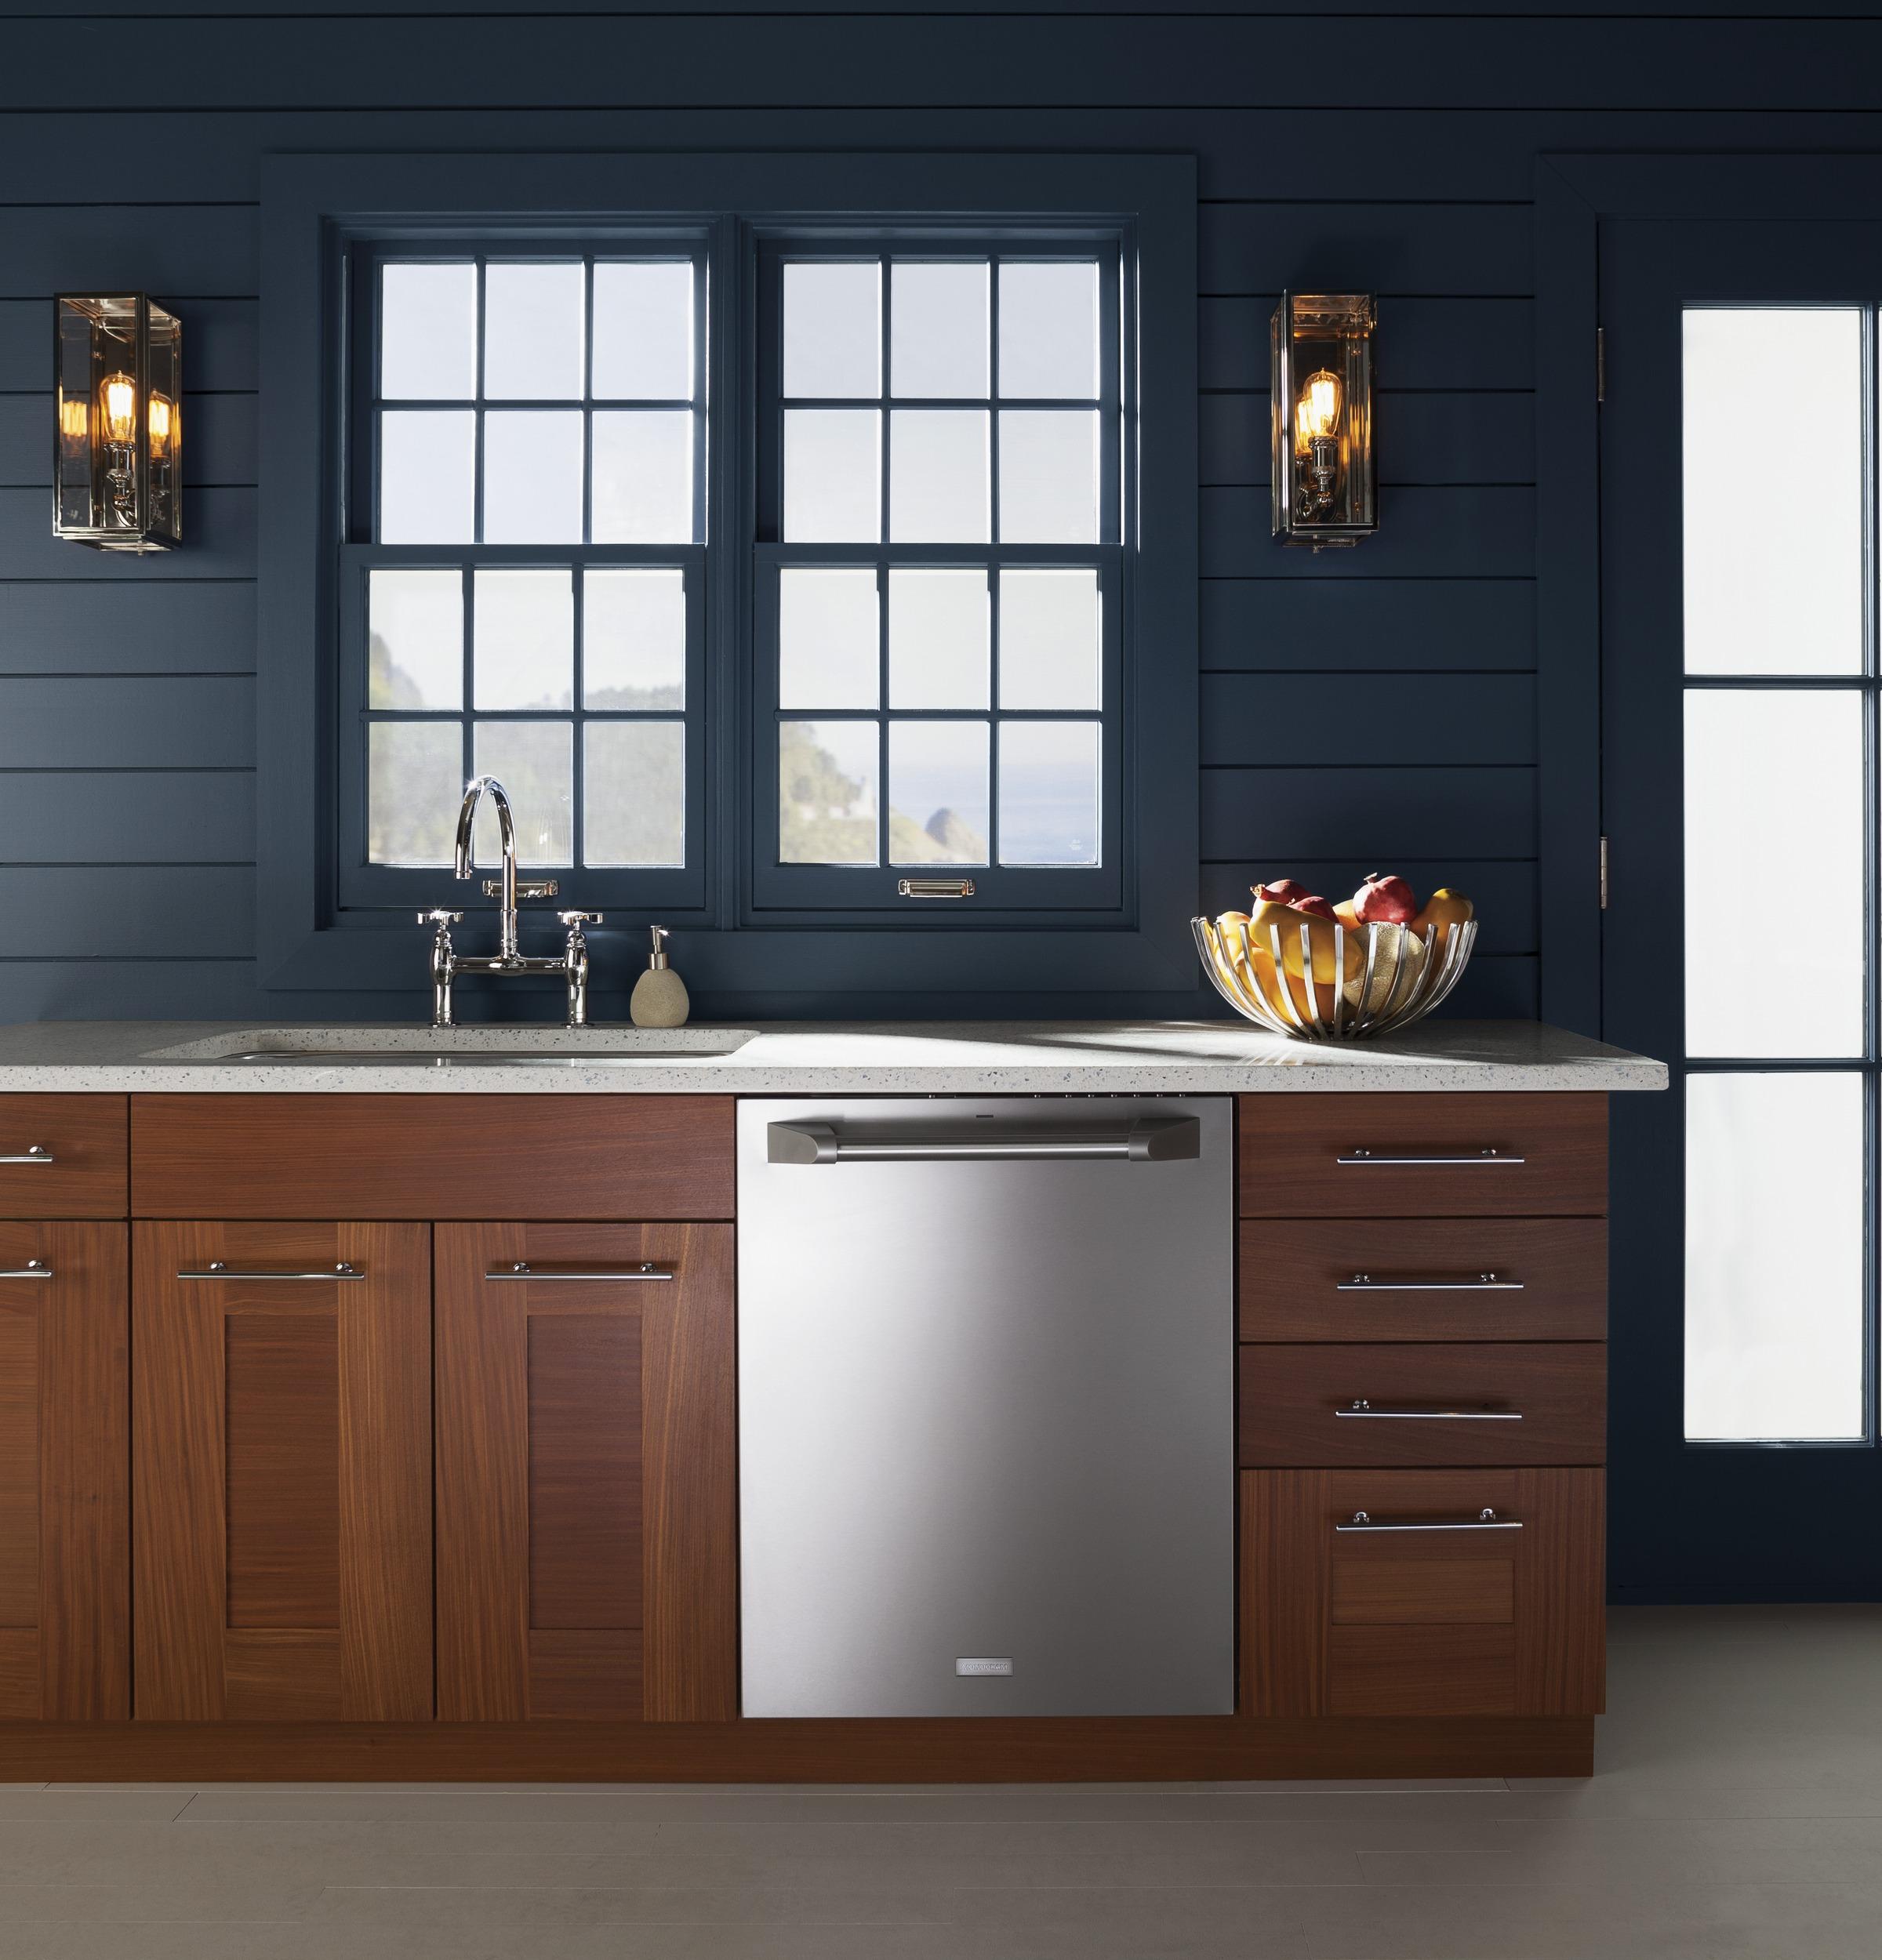 Model: ZDT975SPJSS | Monogram Monogram Smart Fully Integrated Dishwasher